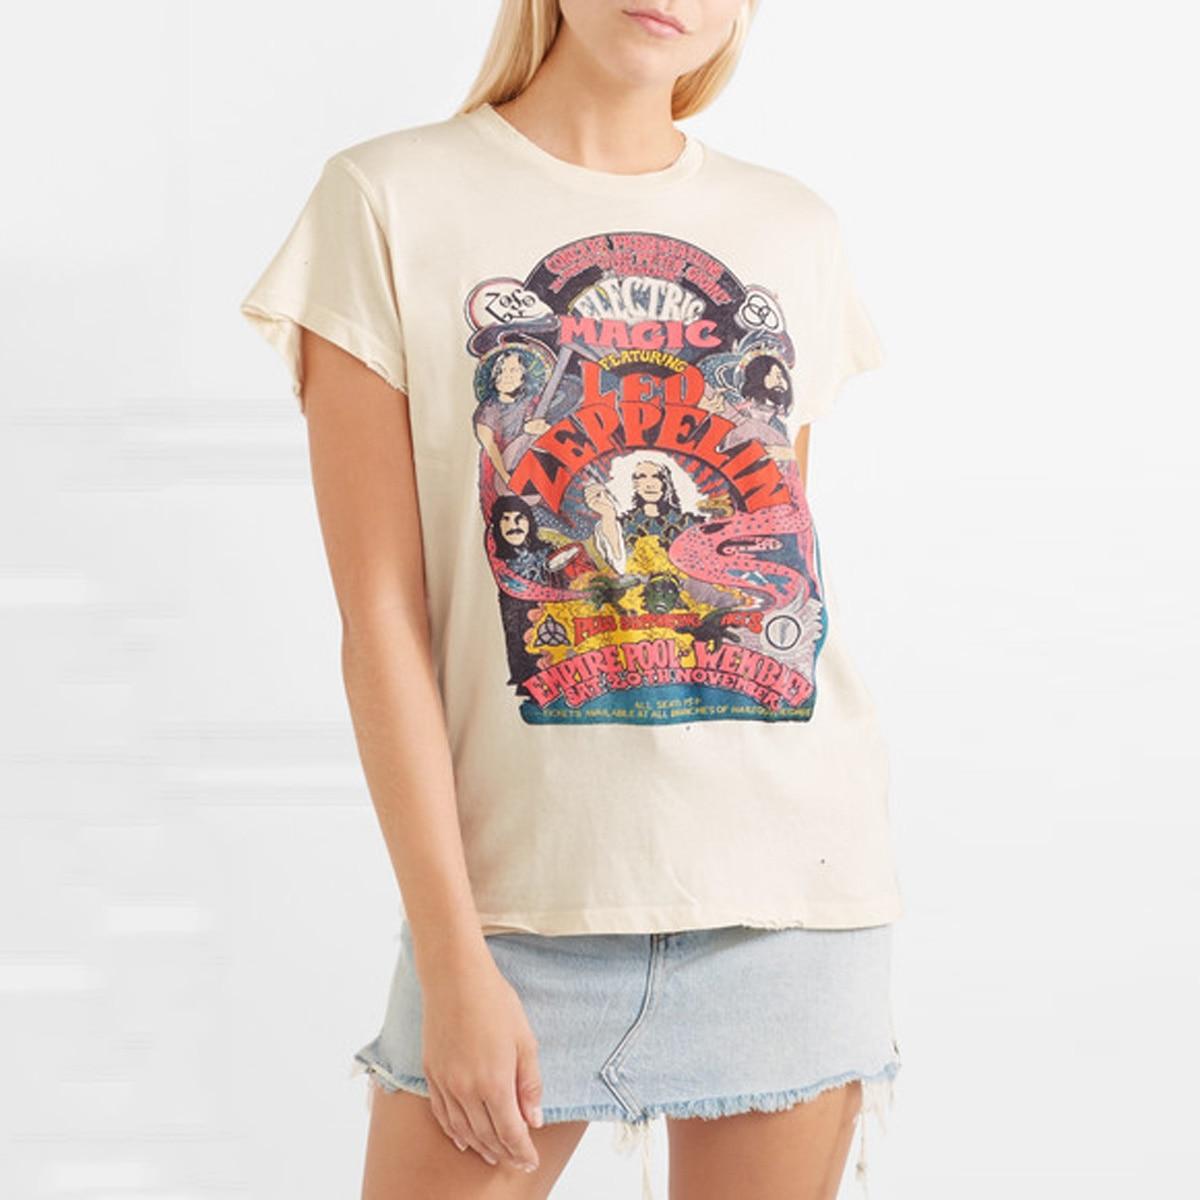 Jastie Magic Cartoon Print T Shirt Short Sleeve Top 2019 New Summer Shirt Tee Round Neck Women Pullover Tops Female T-shirts